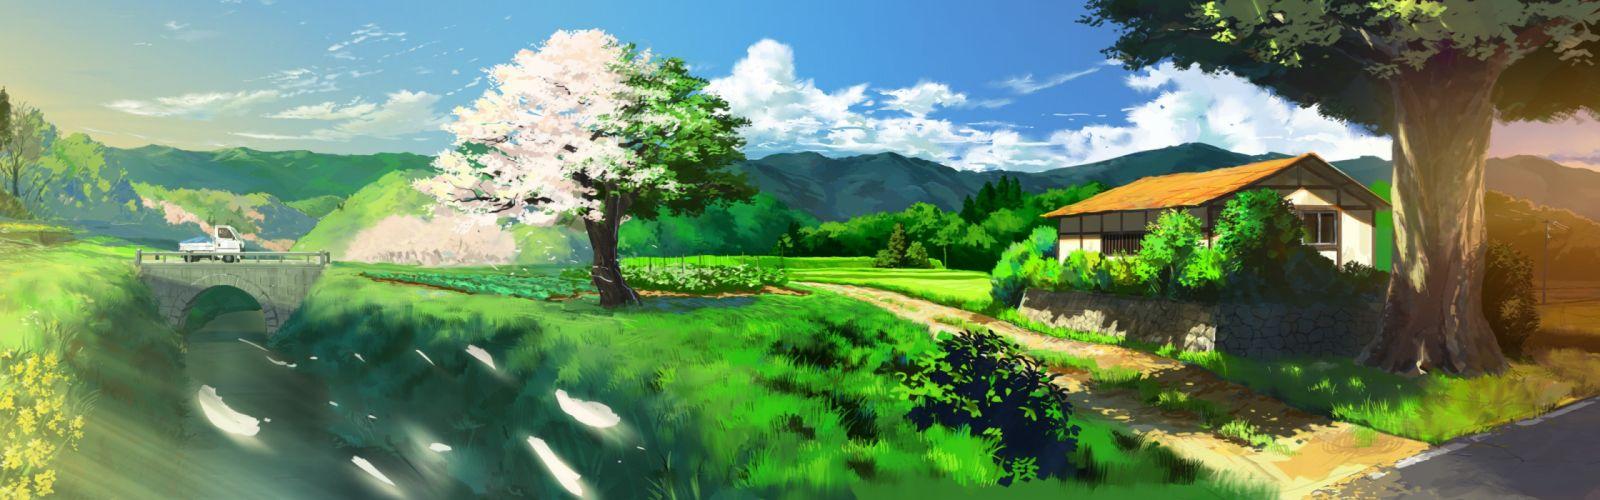 Japan trees cars grass bridges outdoors scenic multiscreen wallpaper